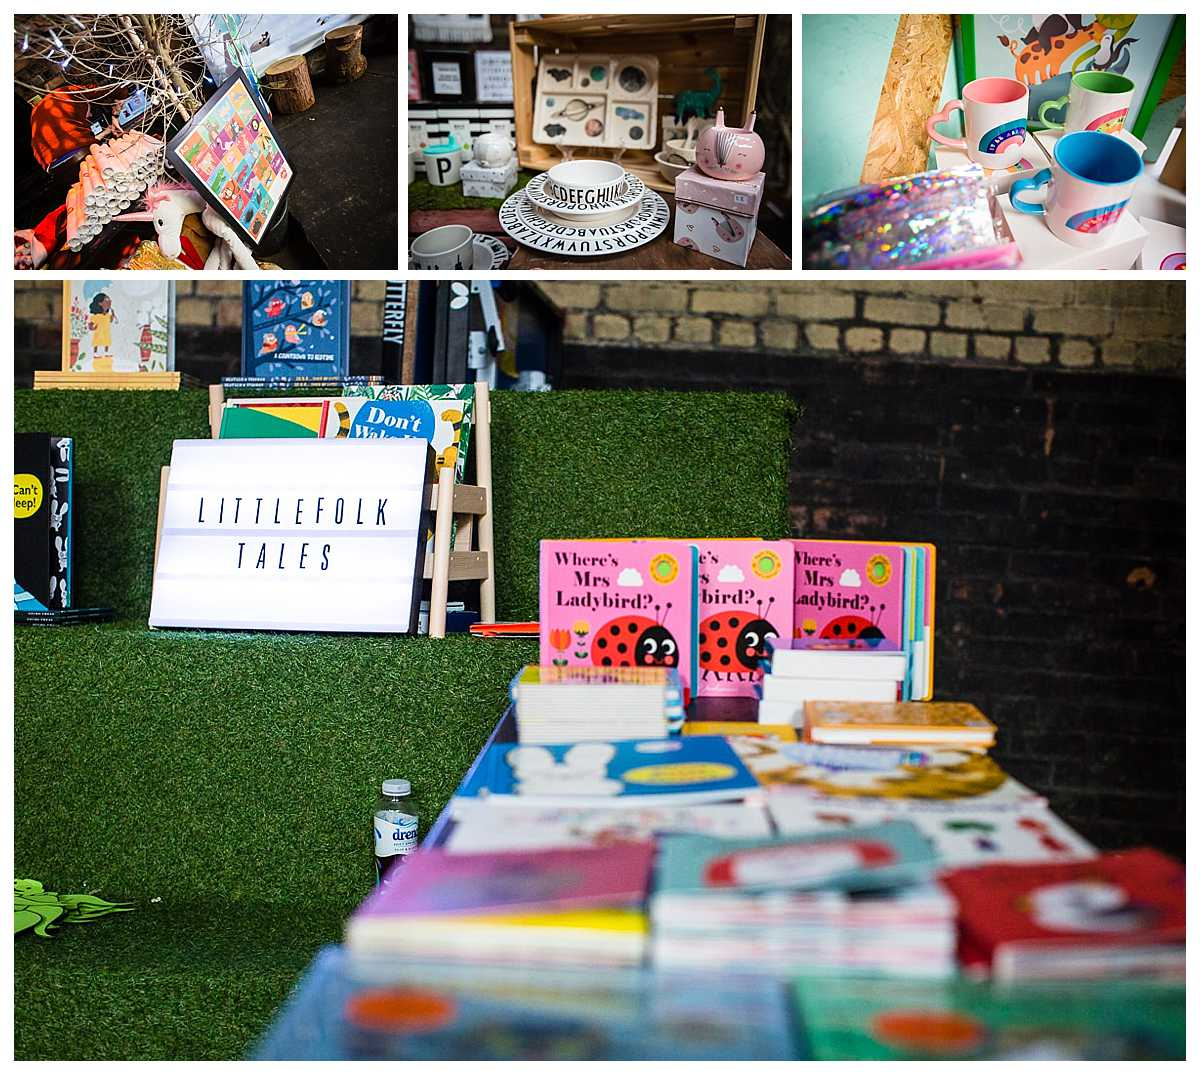 littlefolk tales book set up at parentfolk weekender event